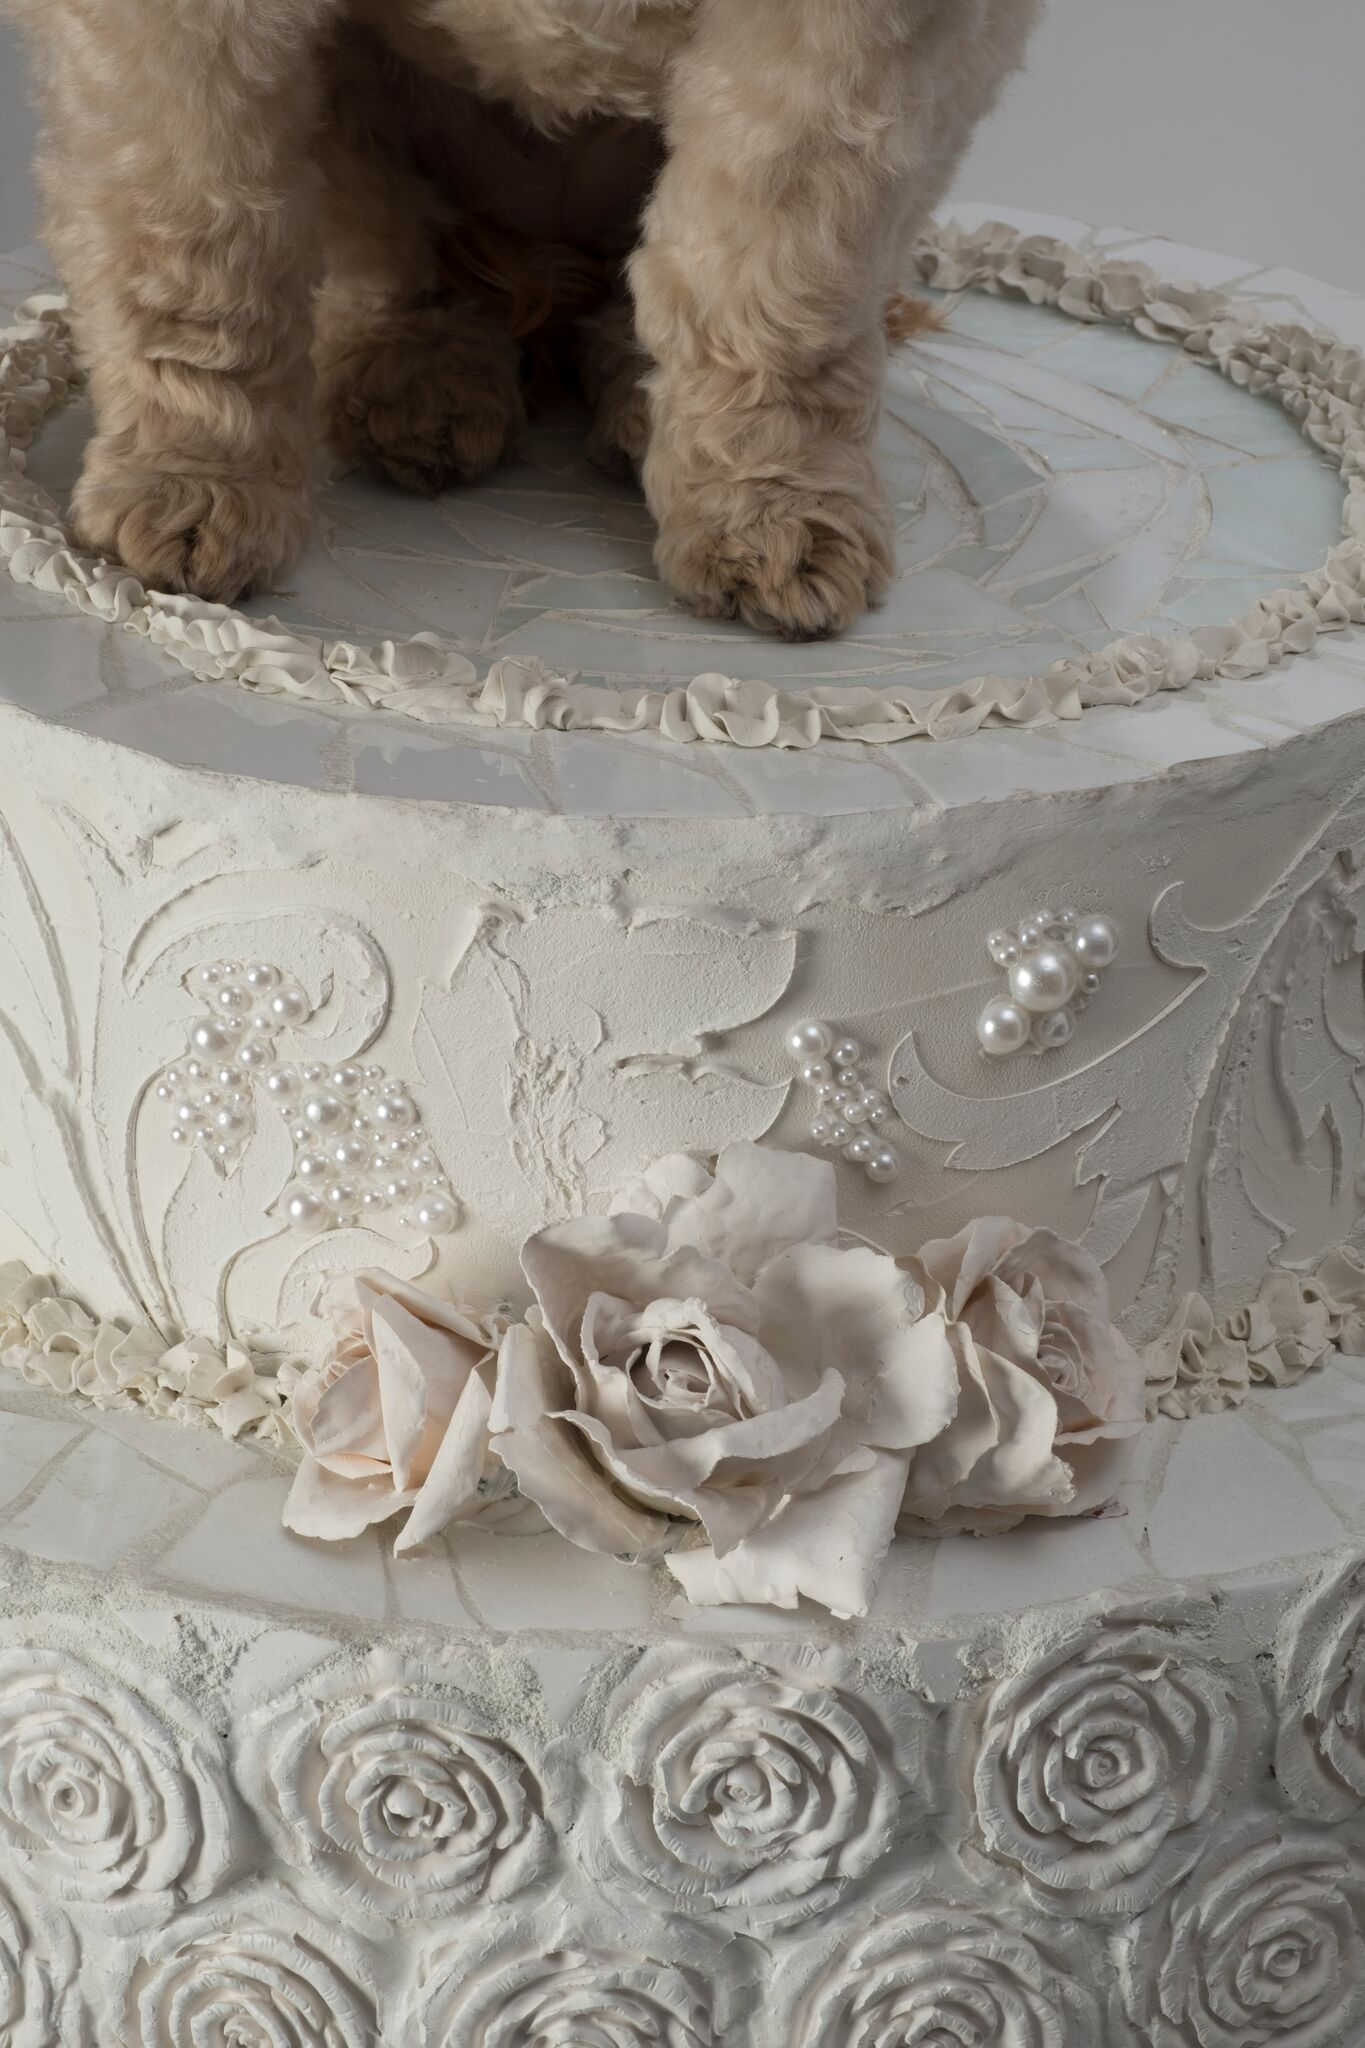 Jeff Monsein - The Royal Wedding Cake House - Image 8 of 9